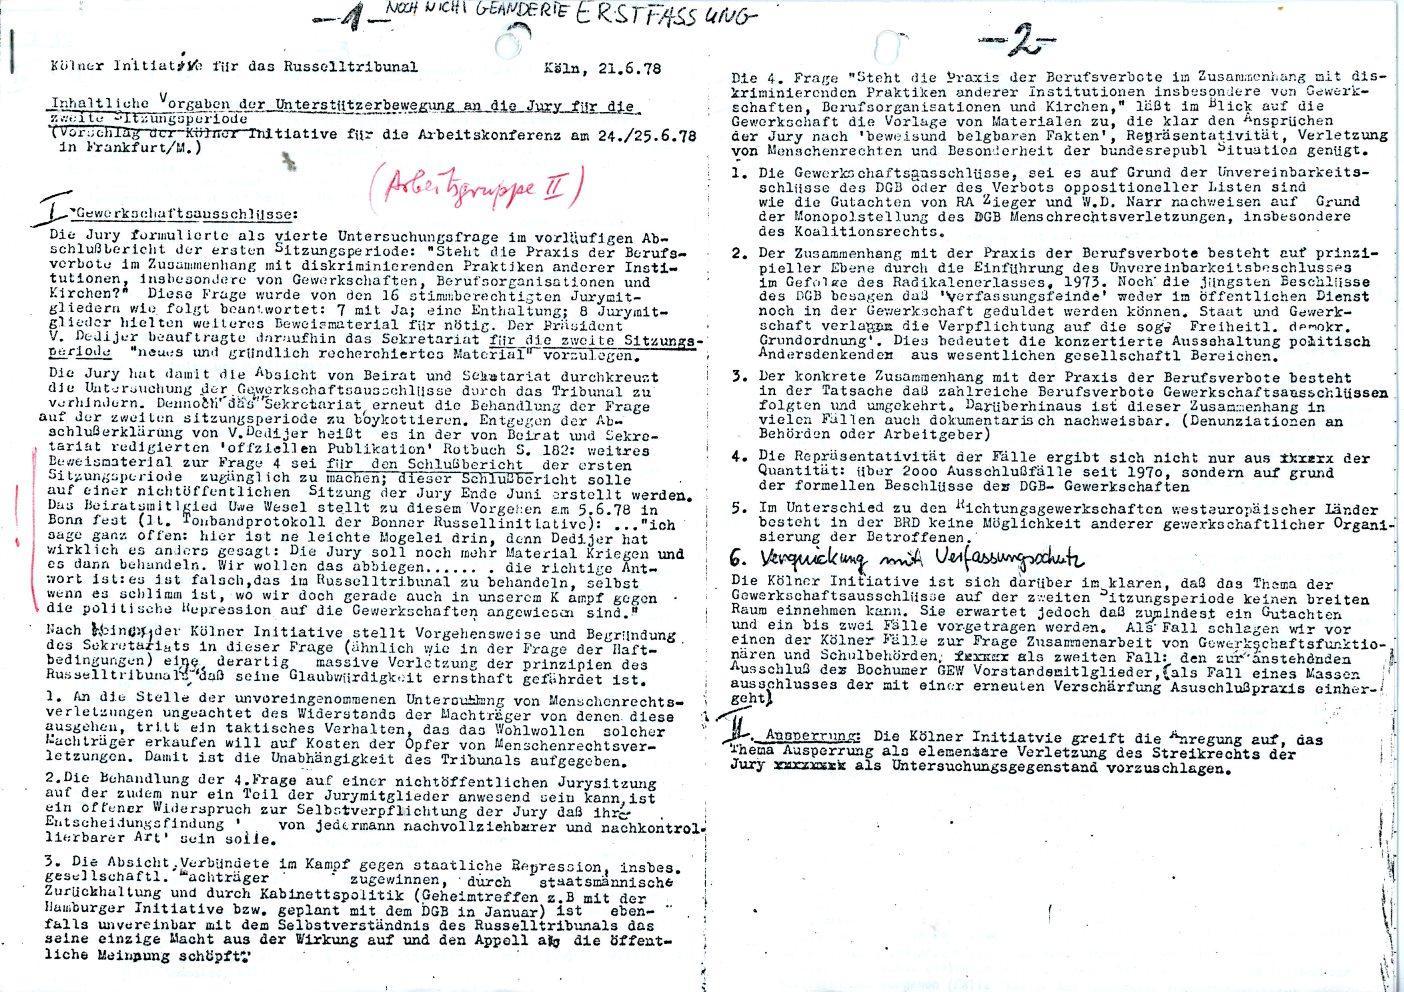 Koeln_Russell_Initiative_Dokumente_1978_04